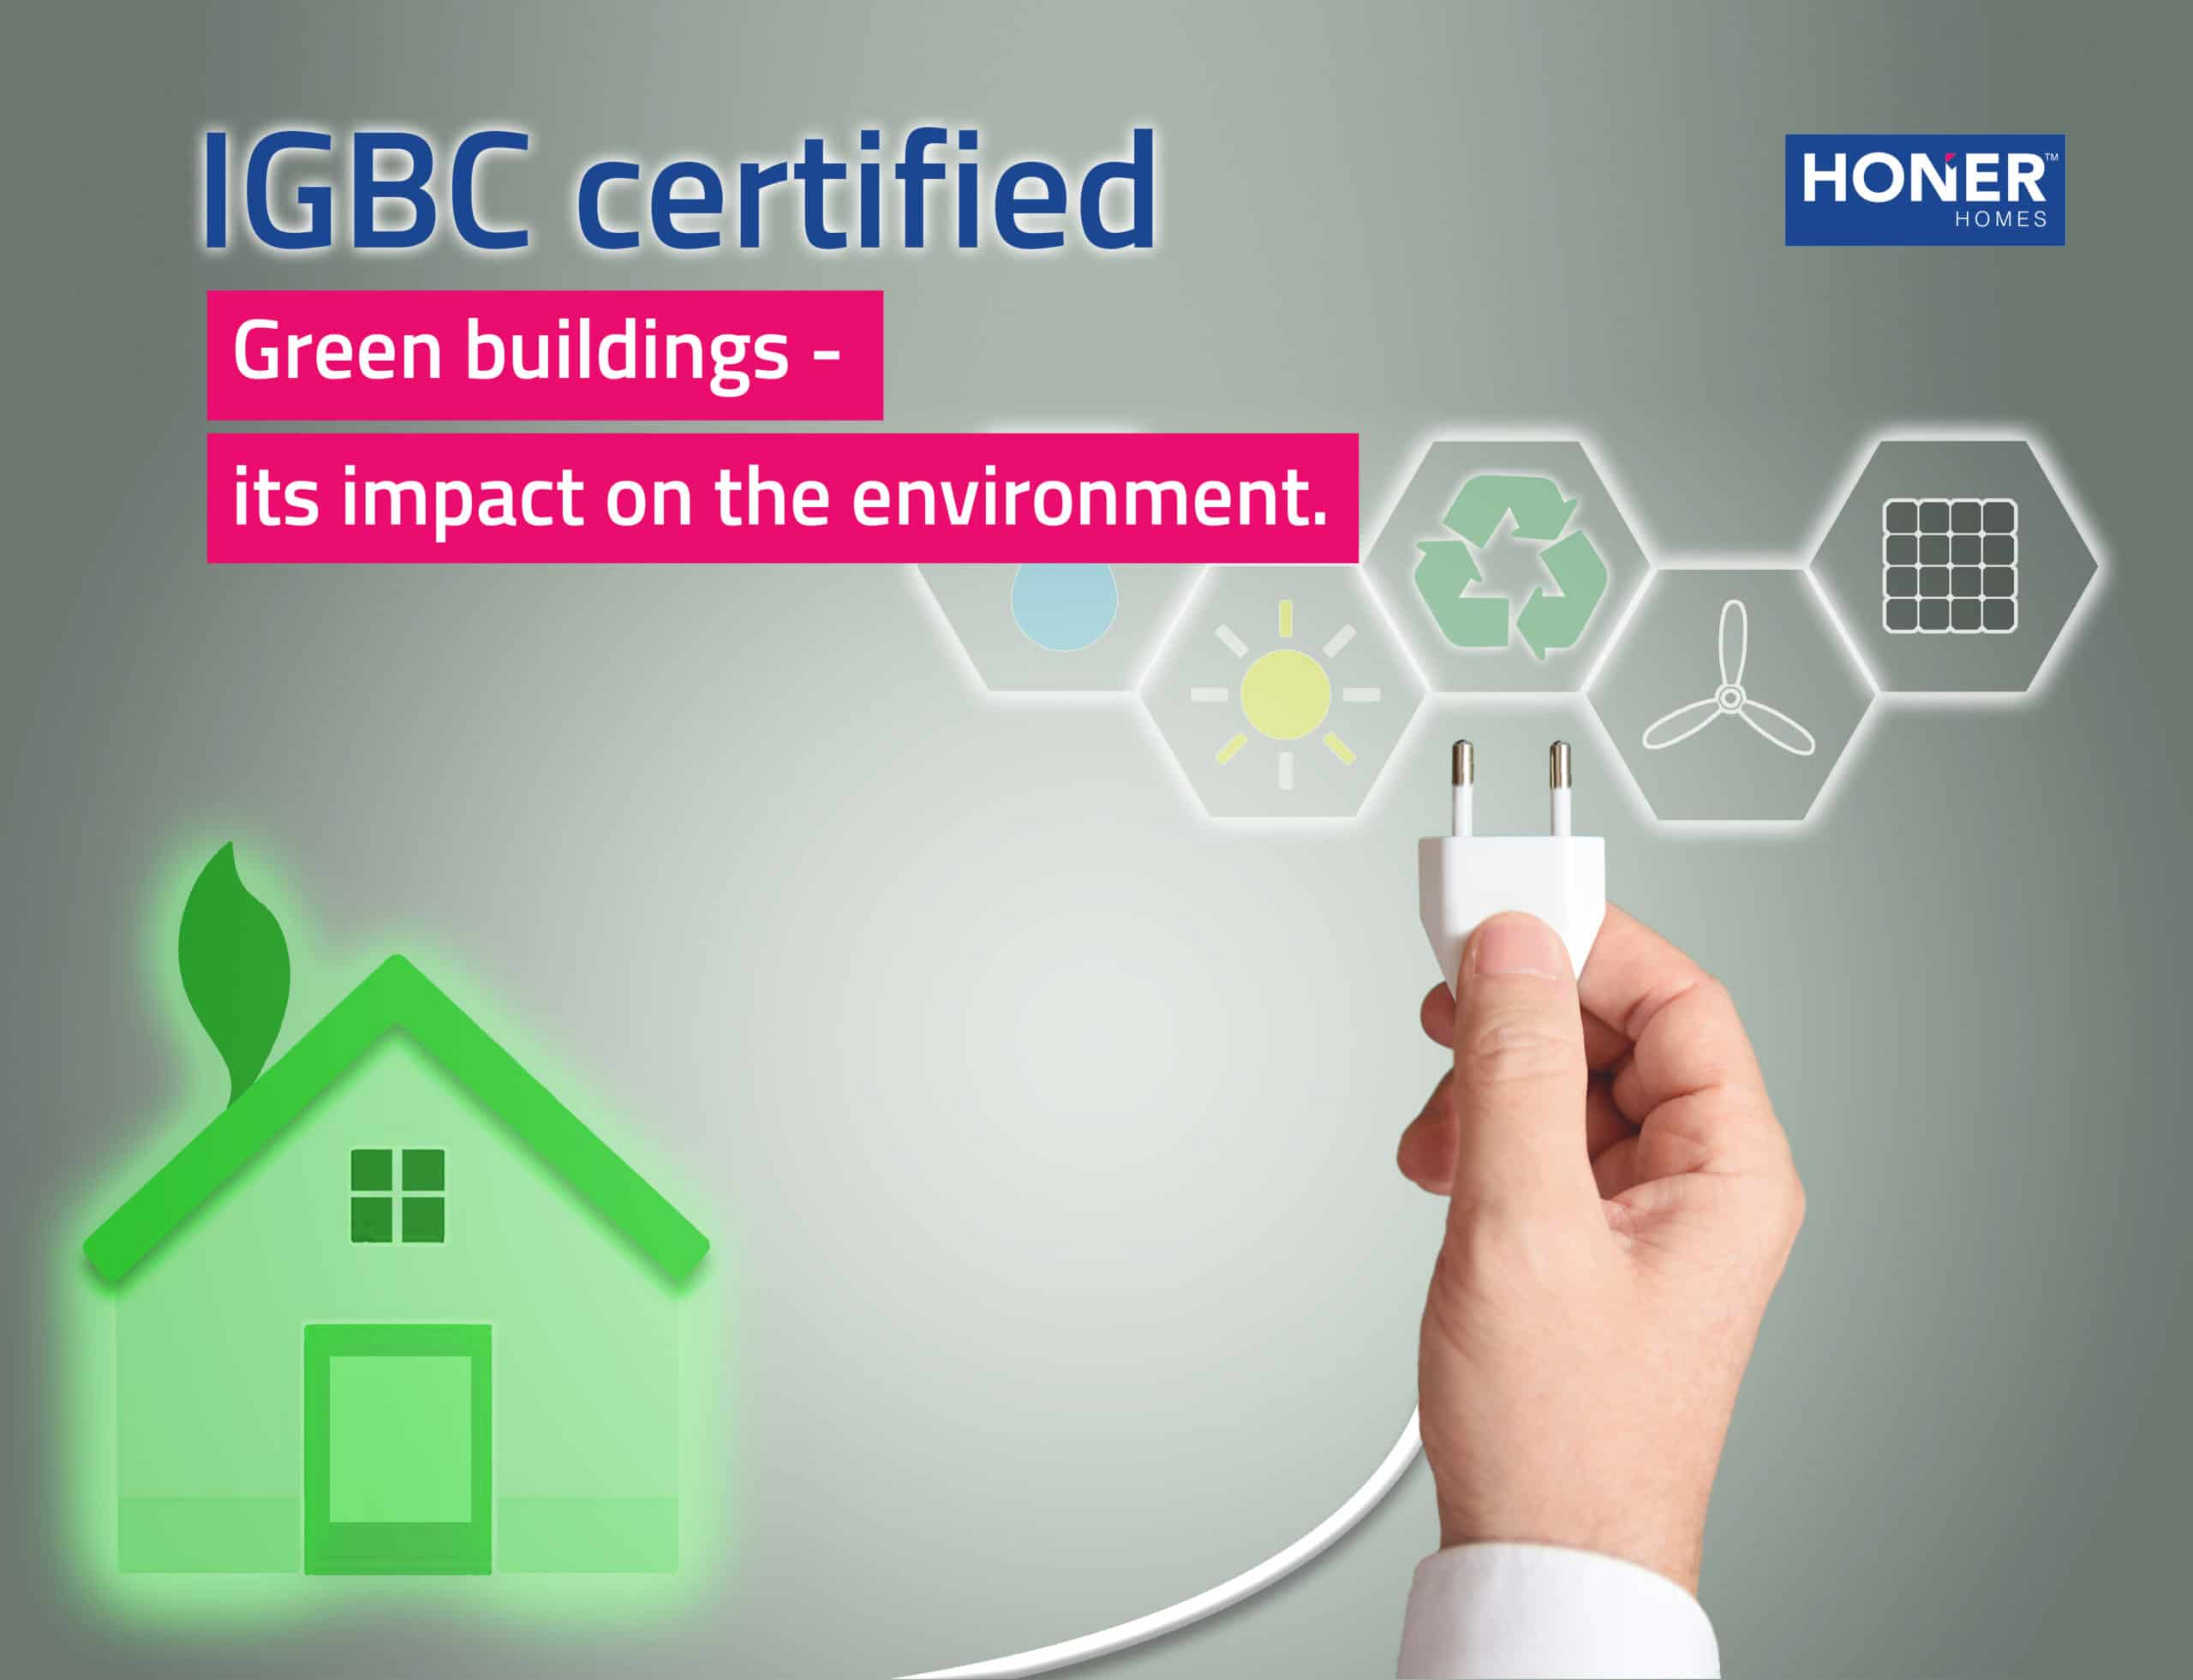 IGBC certified green buildings